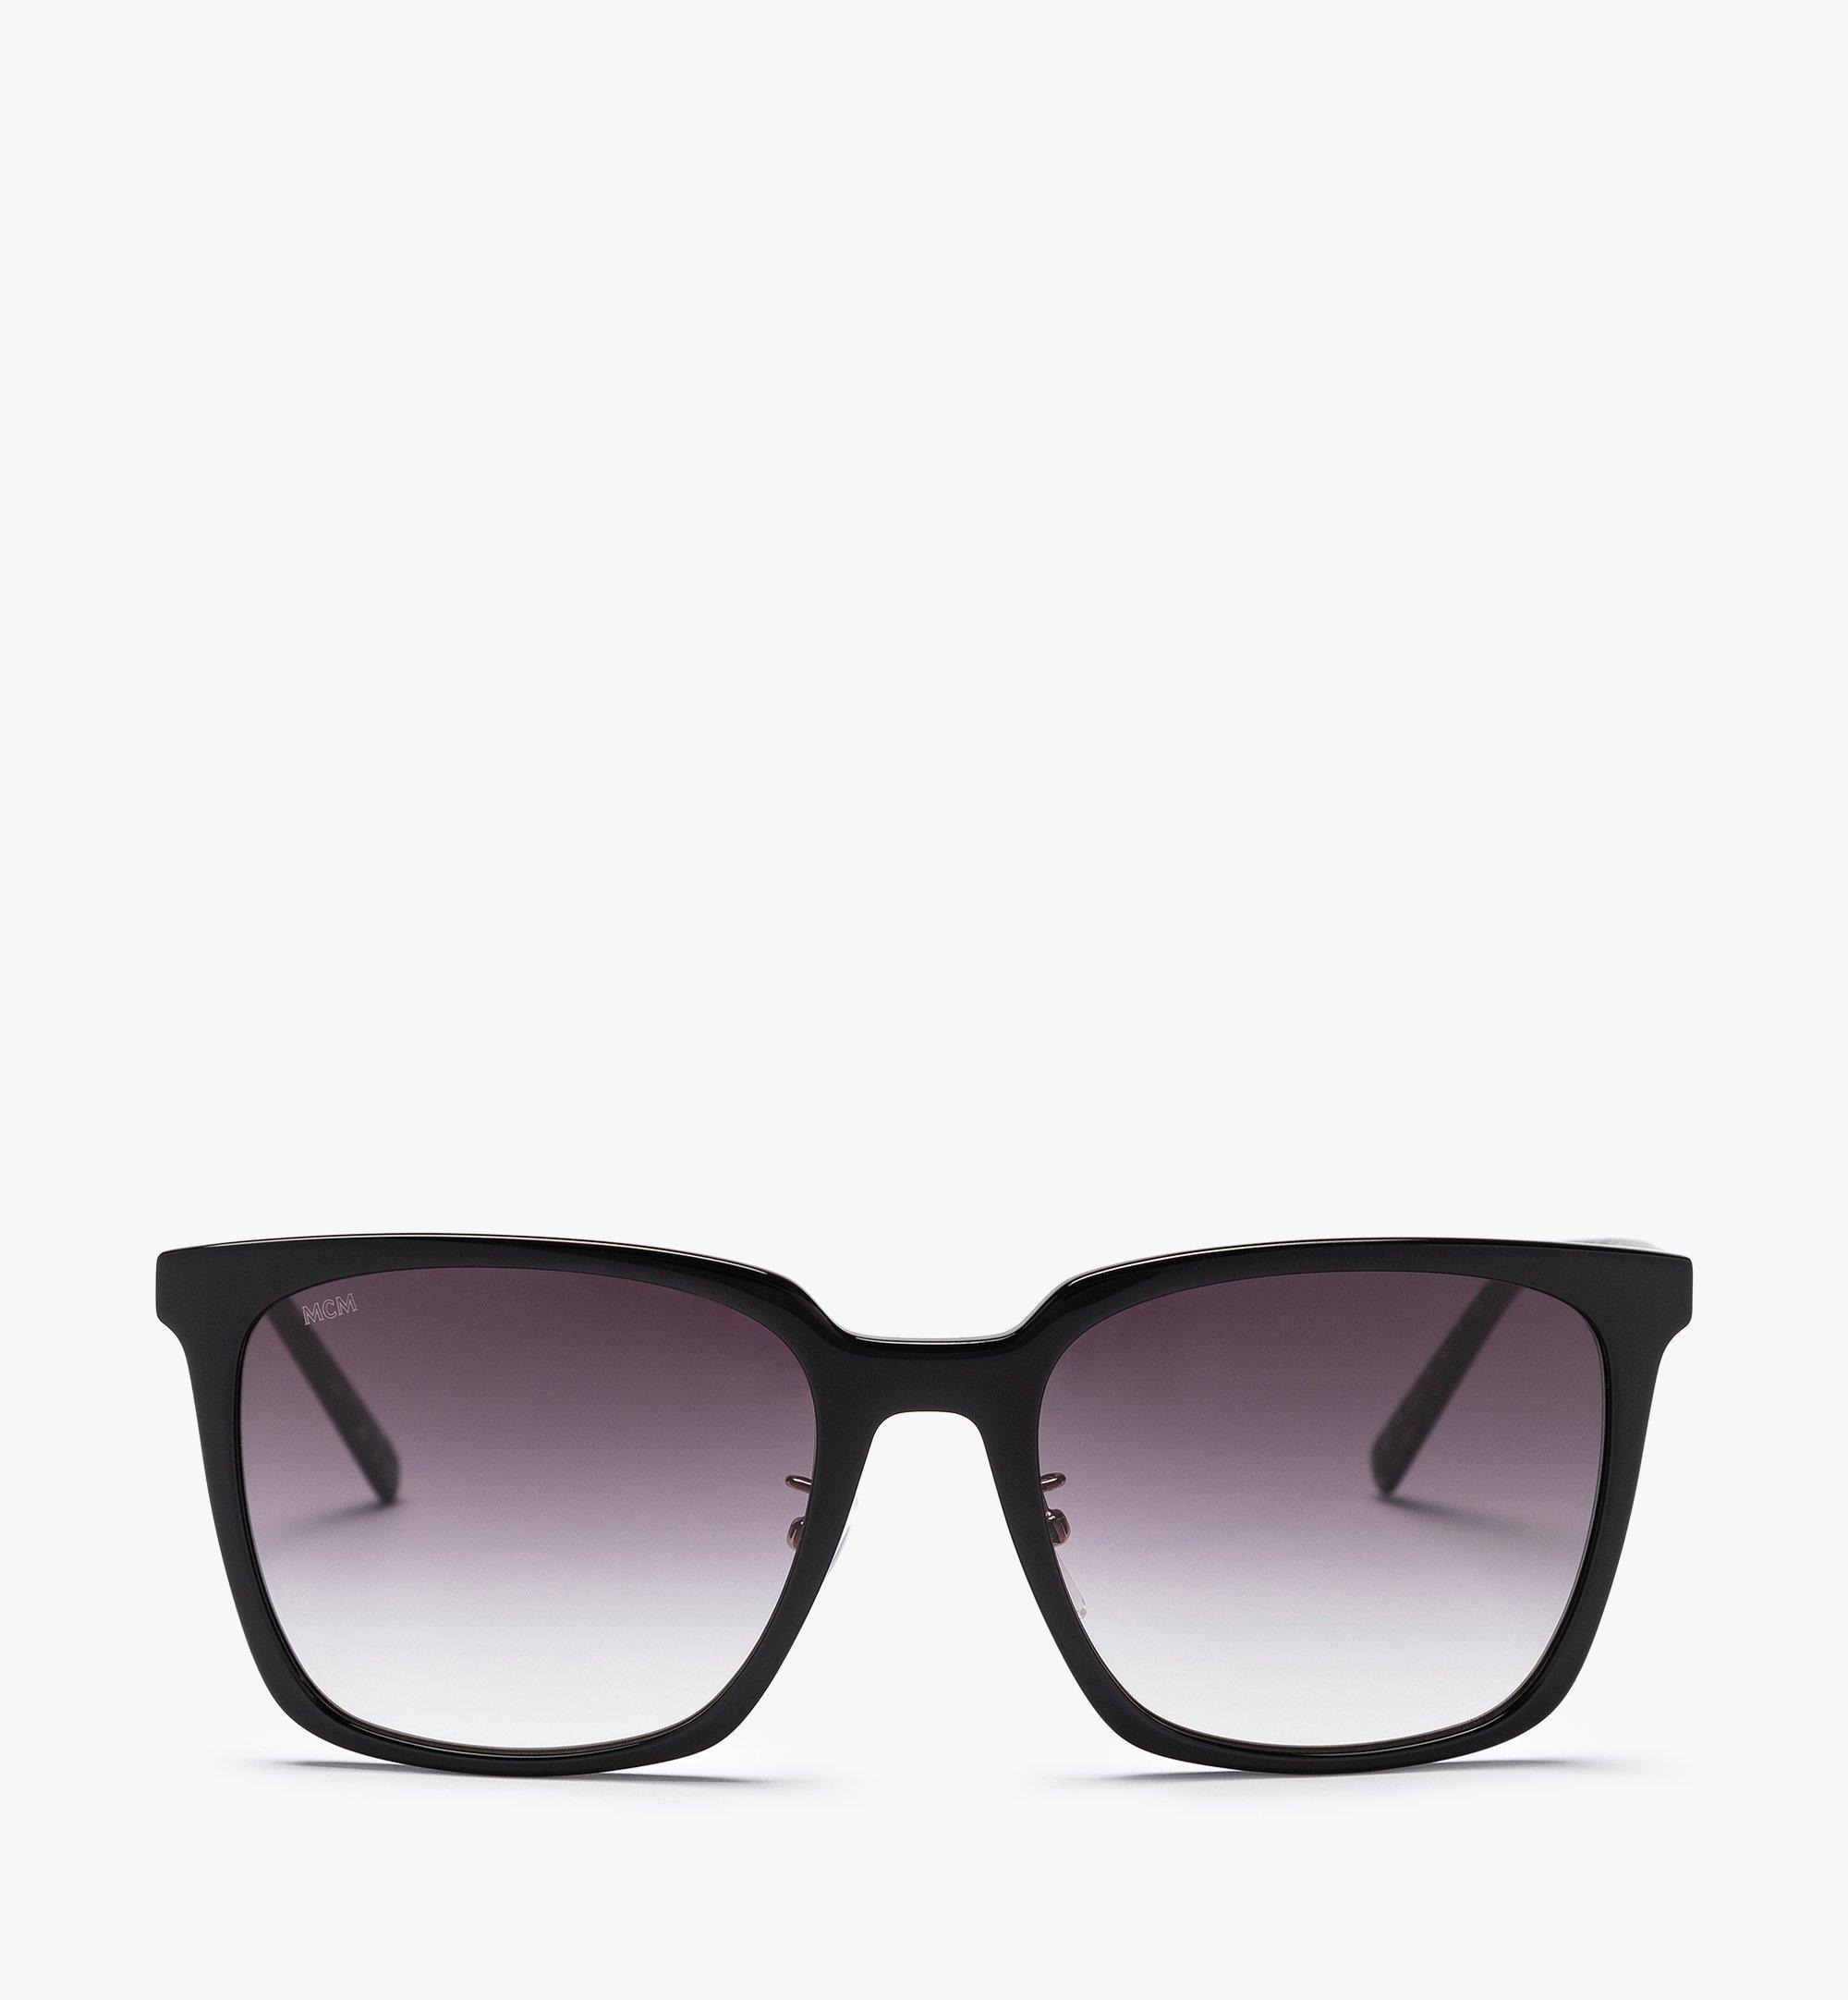 MCM MCM714SA Rectangular Sunglasses Black MEGBAMM10BK001 Alternate View 1